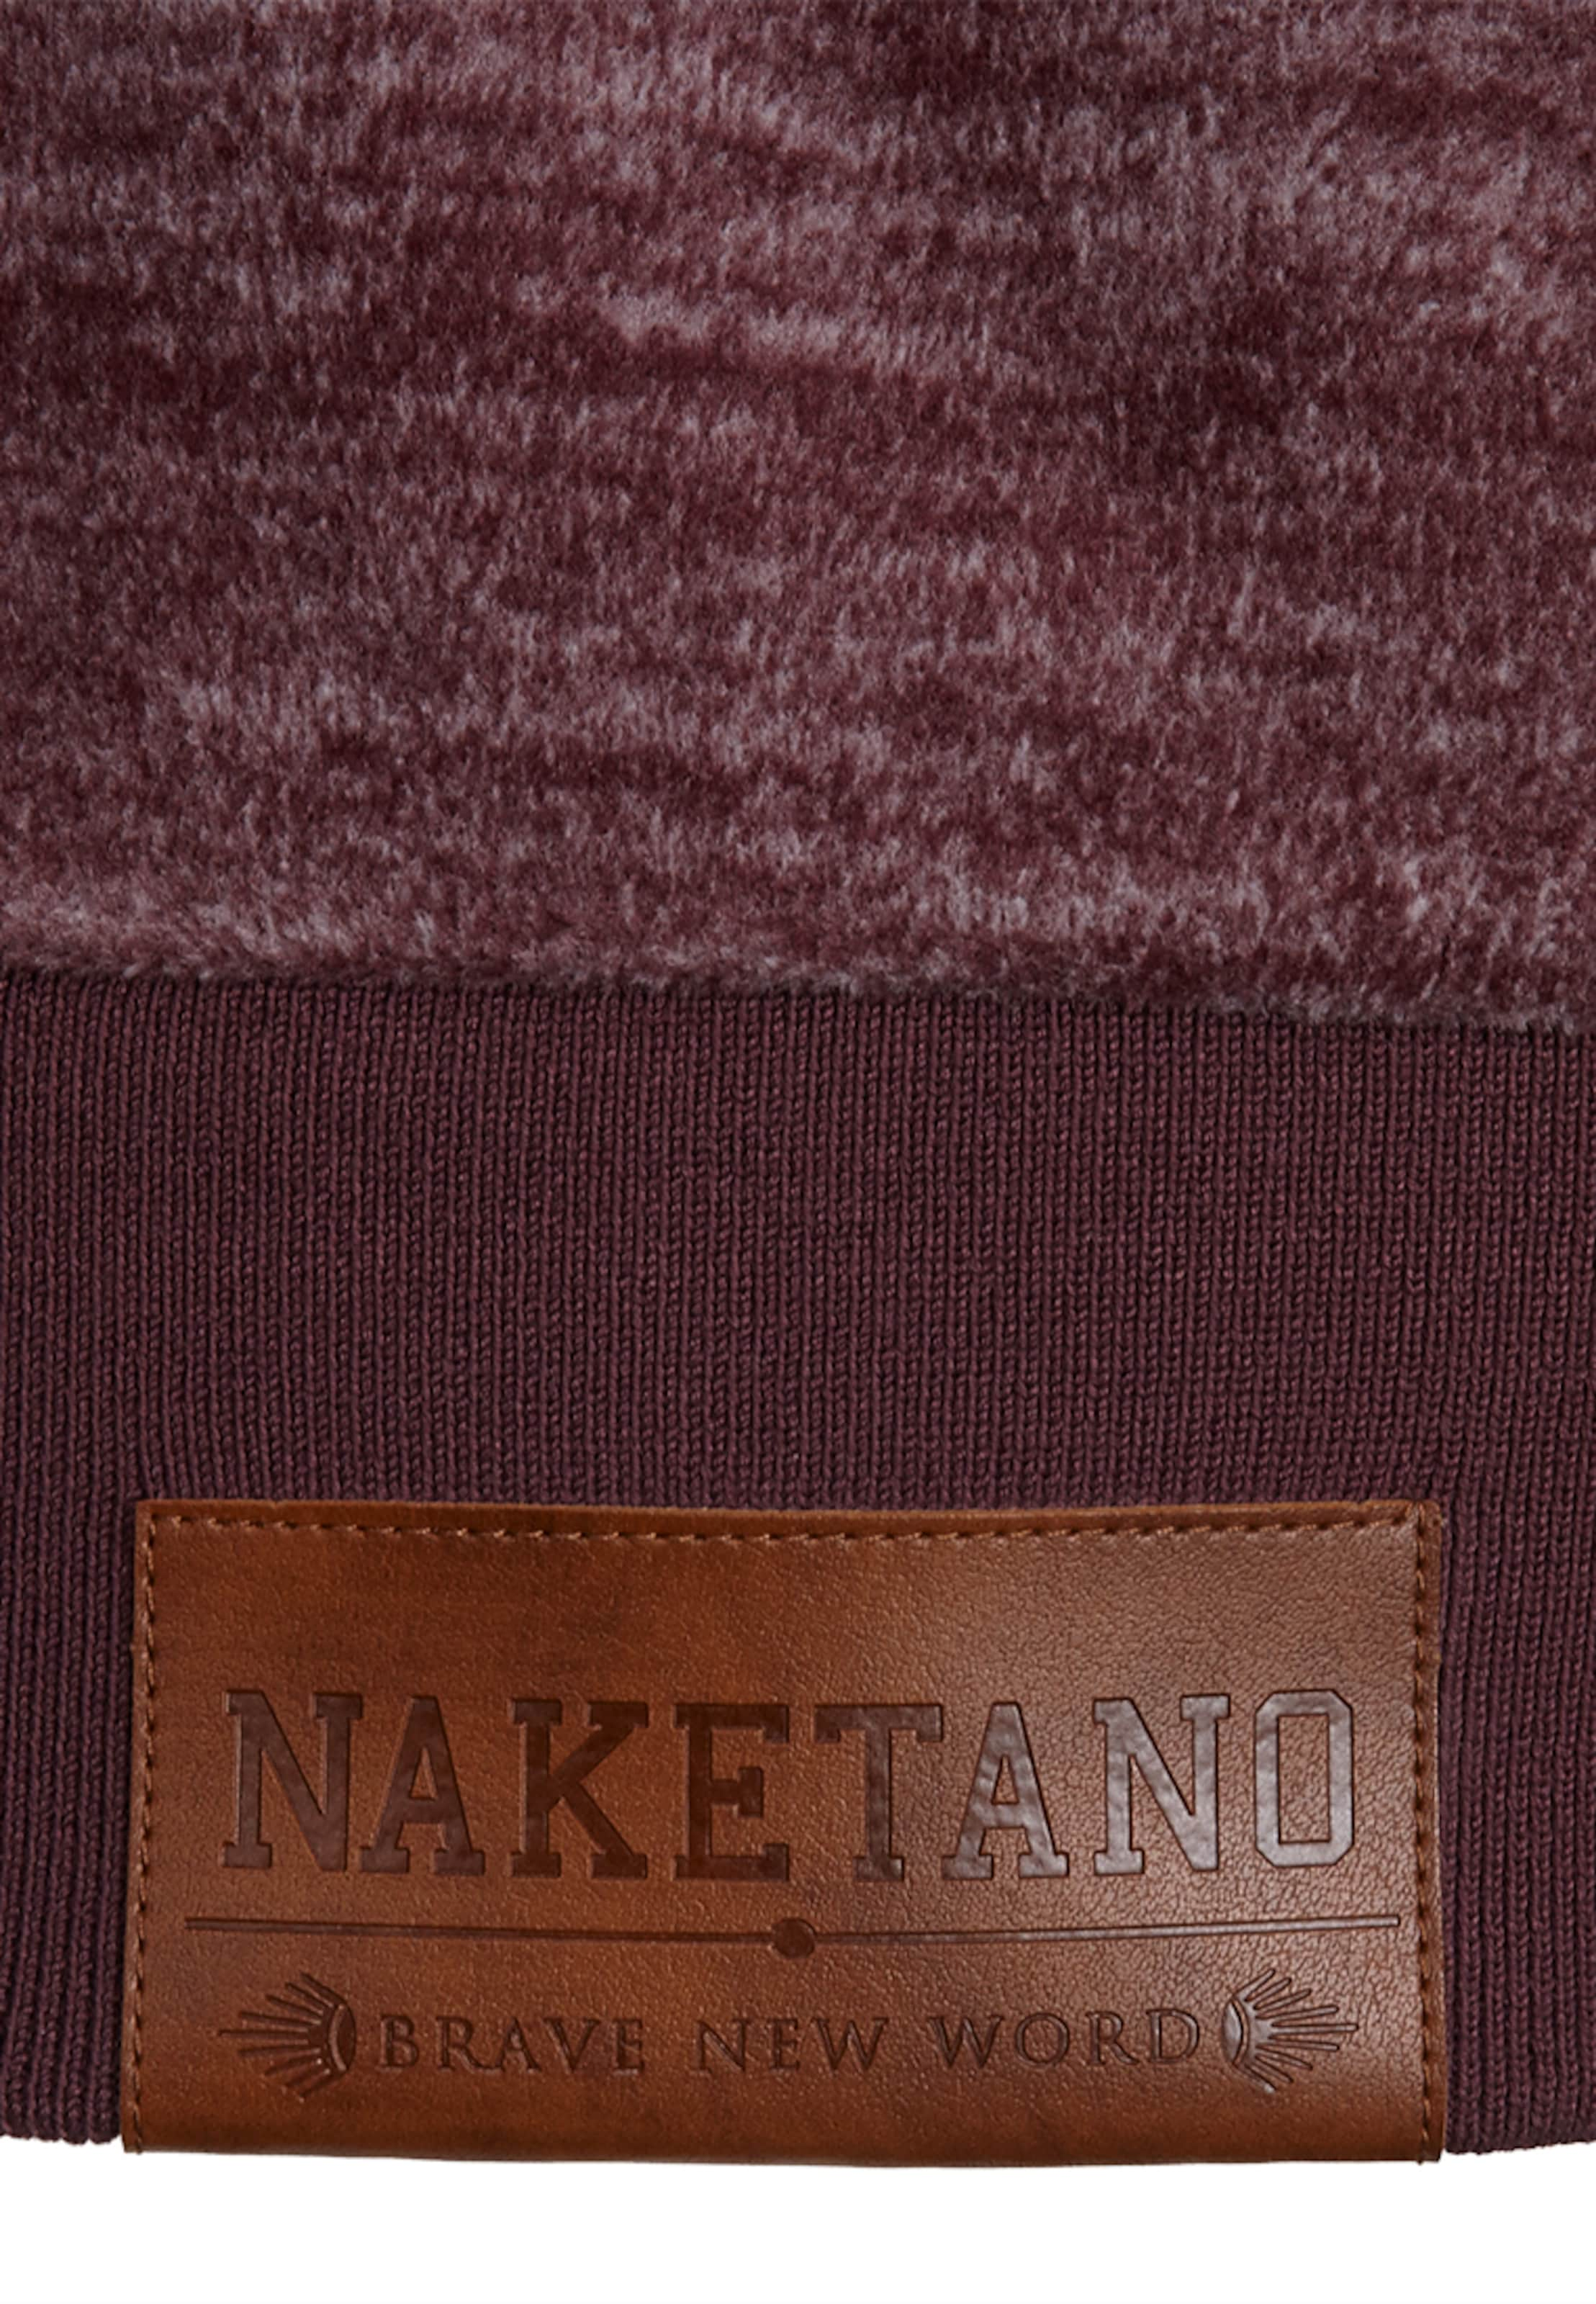 Spielraum 2018 Neu Bestes Geschäft Zu Erhalten Online-Verkauf naketano Zipped Jacket 'Hamza Bau Ma J iii' Online 100% Garantiert 8oHfG3gG4